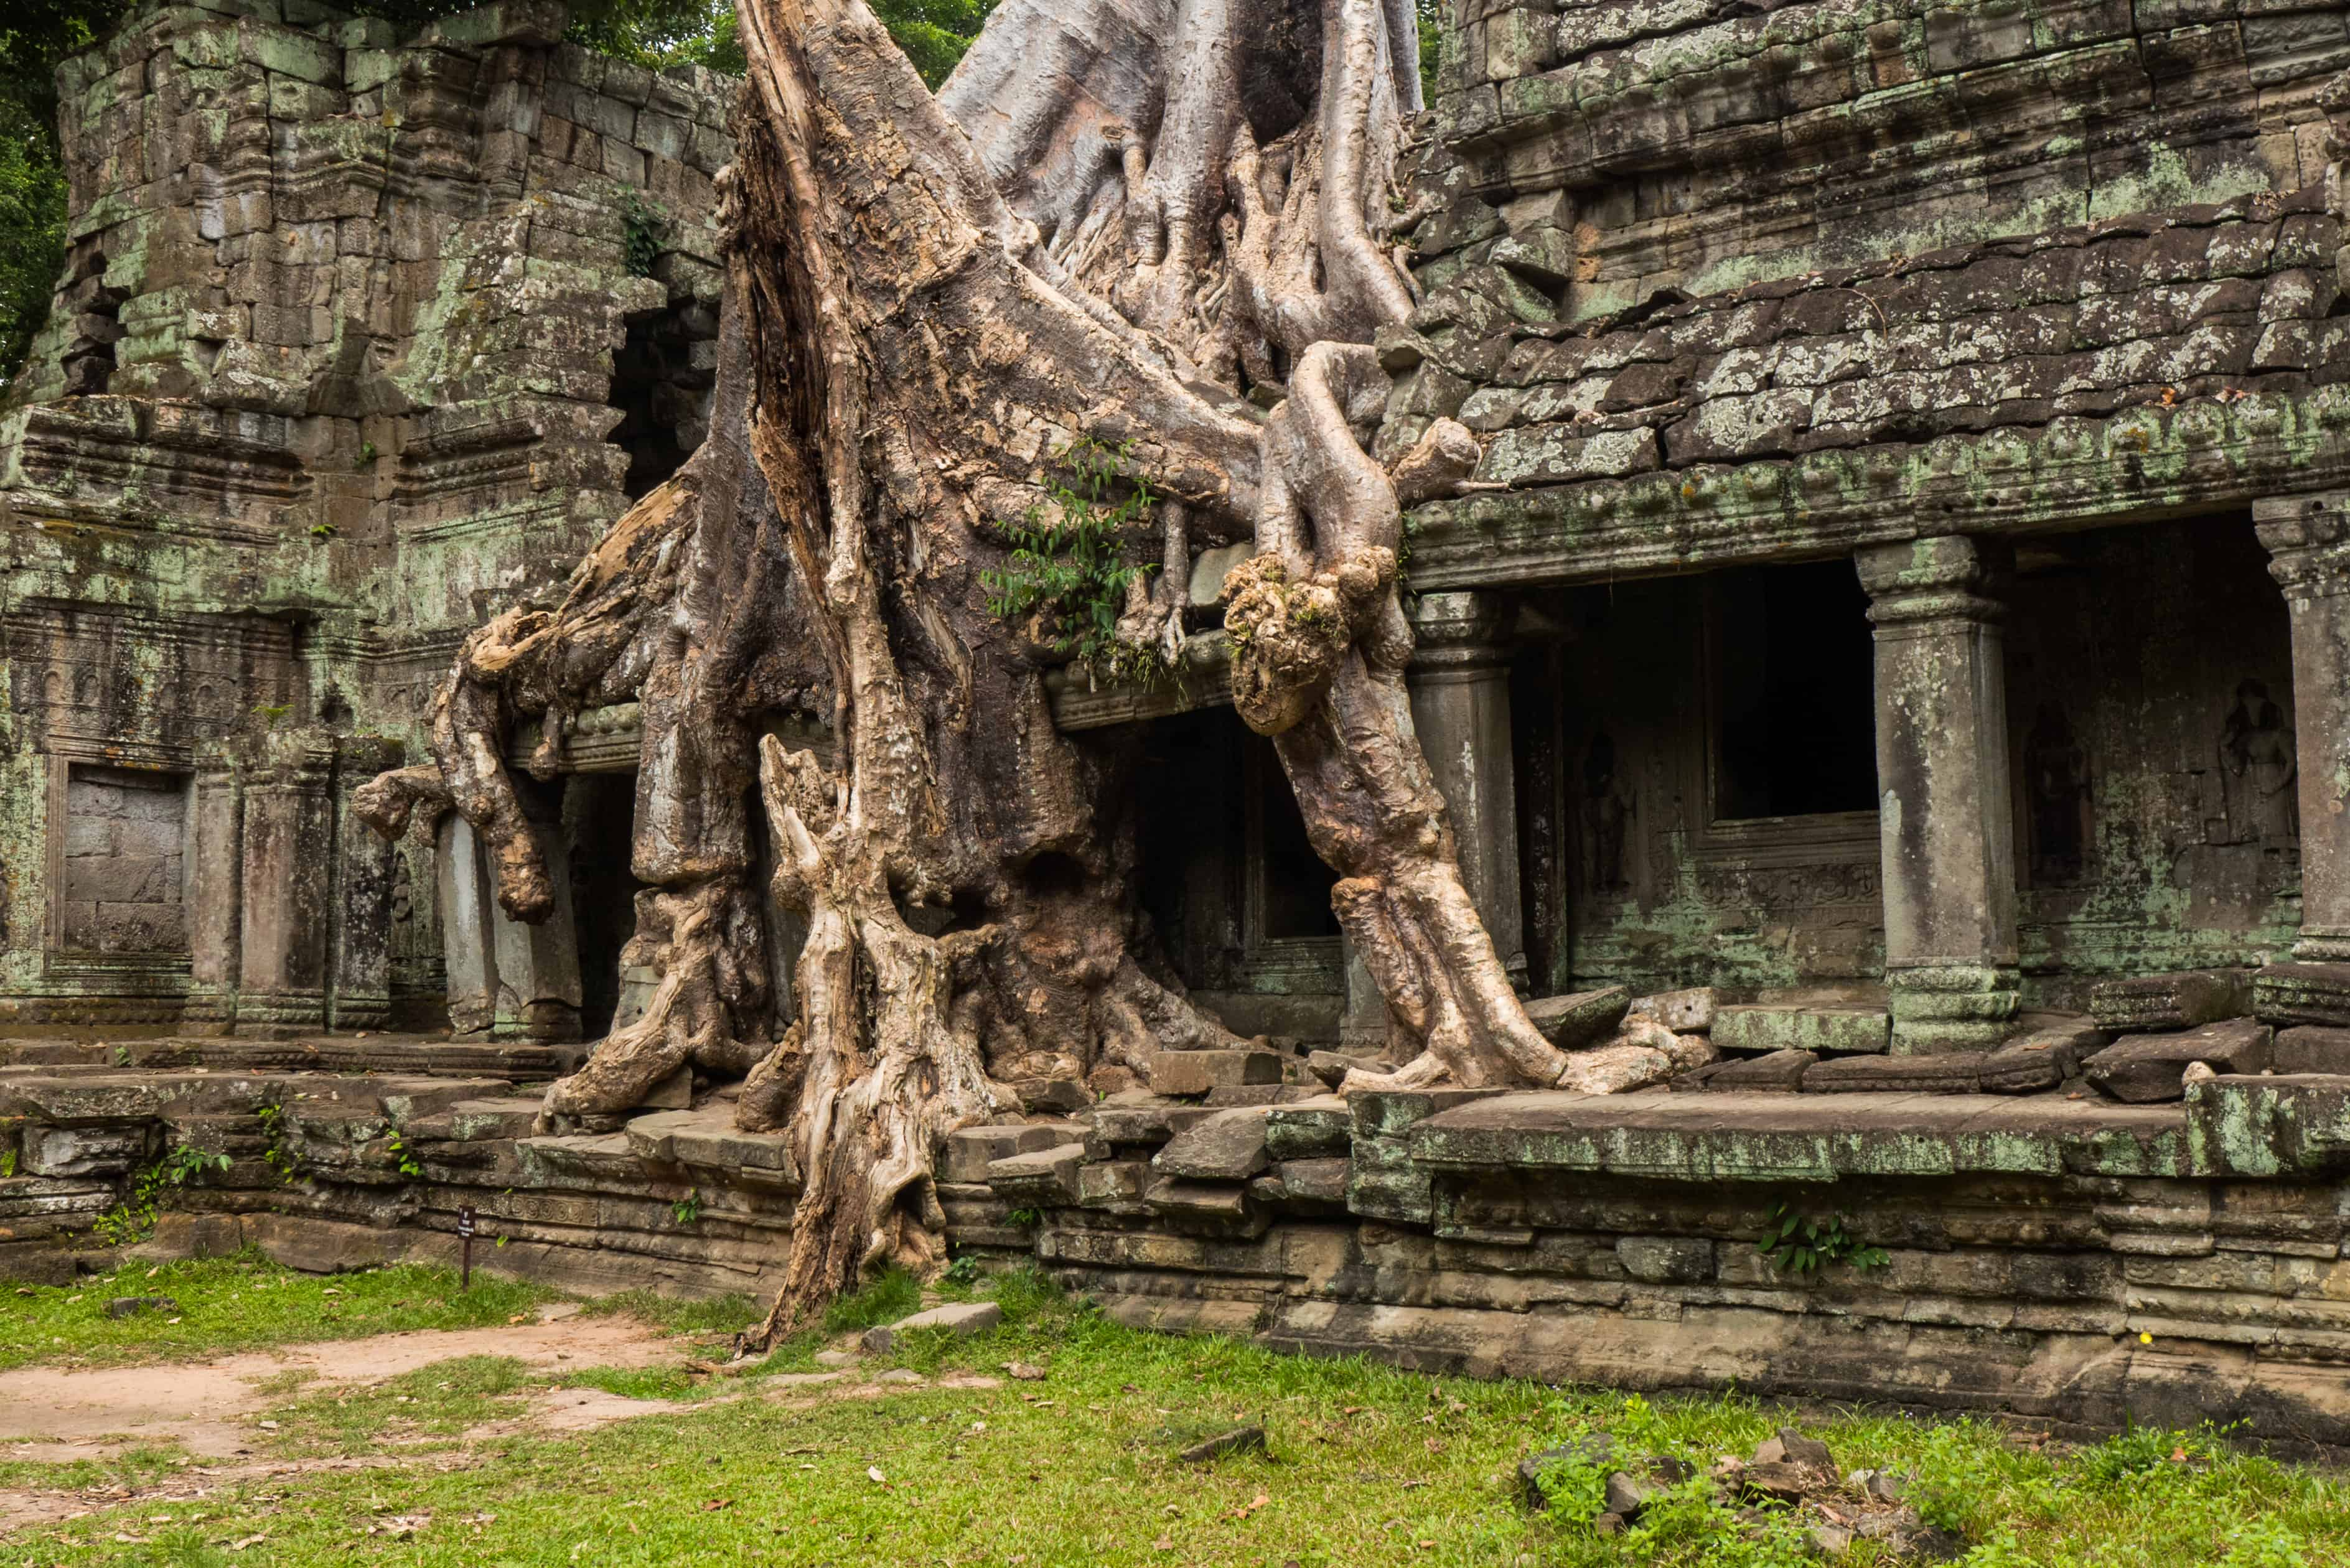 Praeh Khan, drzewo, Angkor Wat zwiedzanie